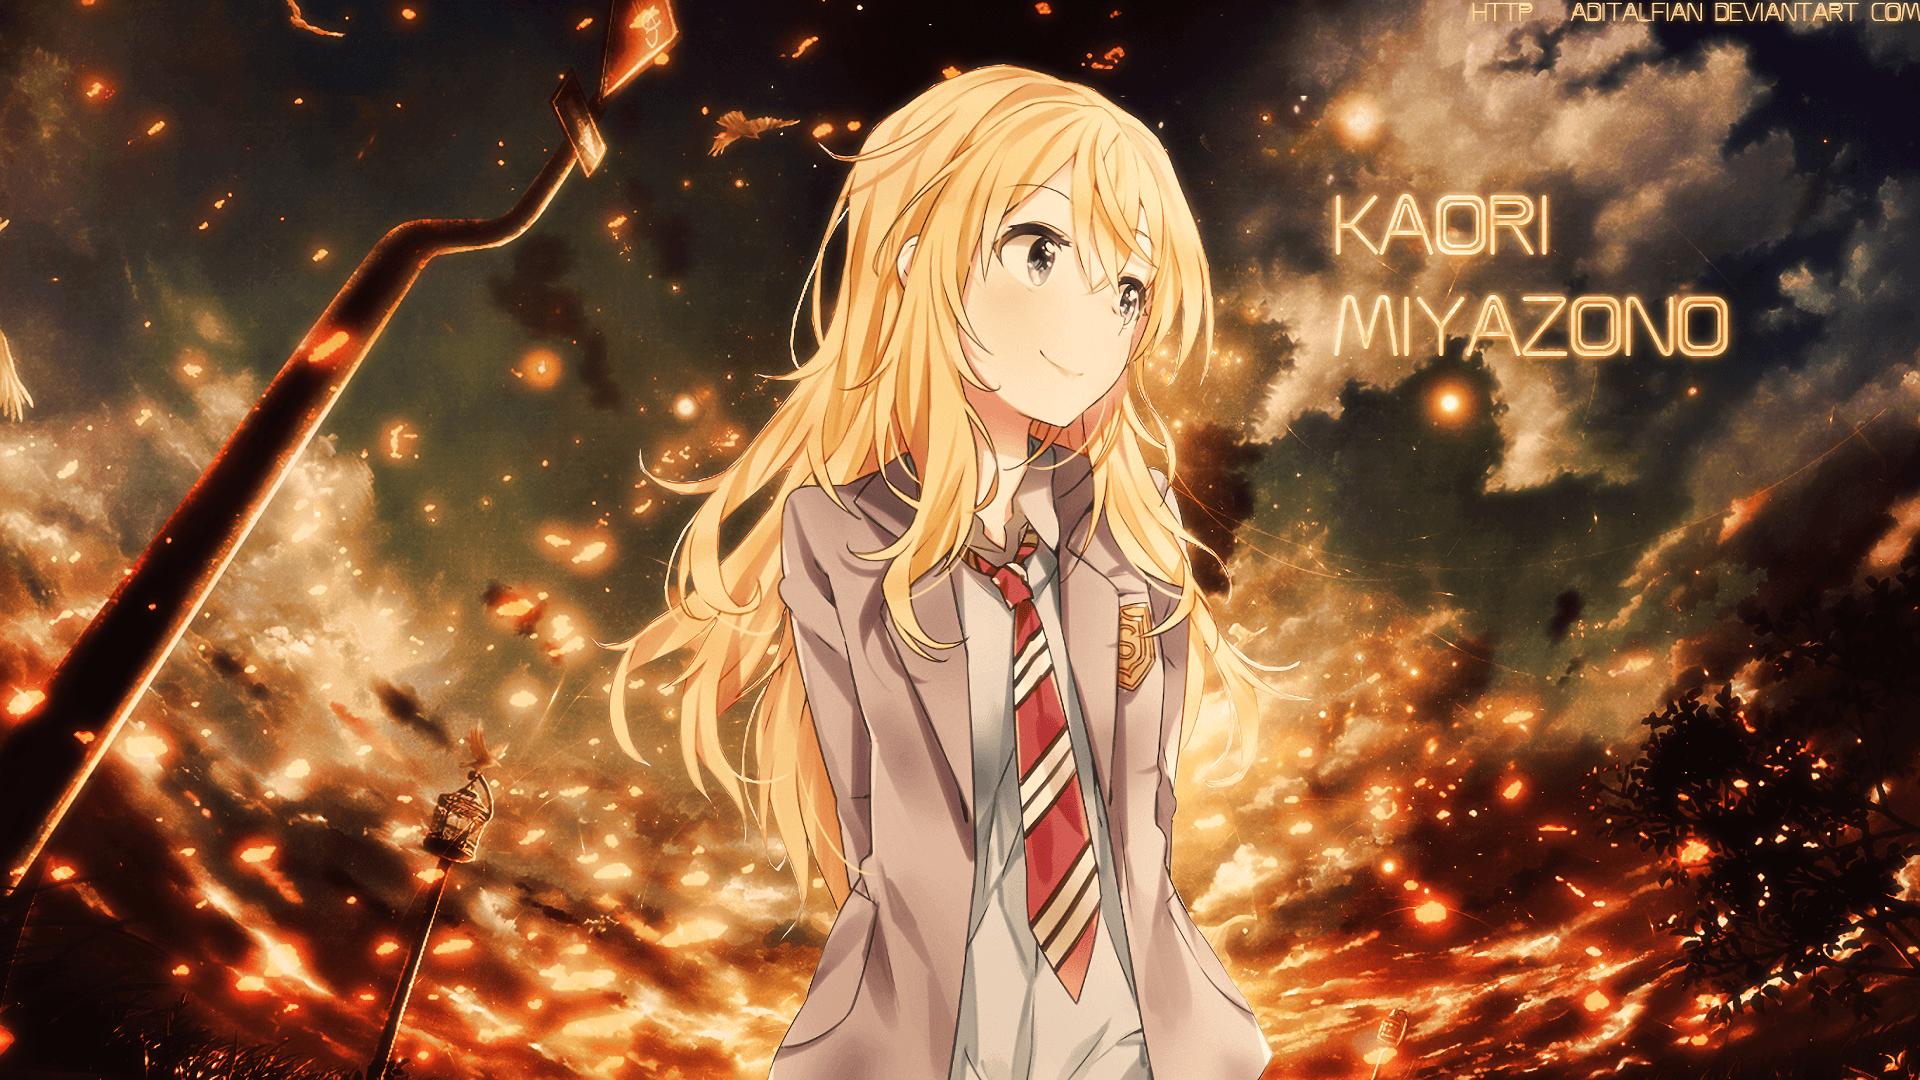 Cool Kaori Miyazono Wallpaper